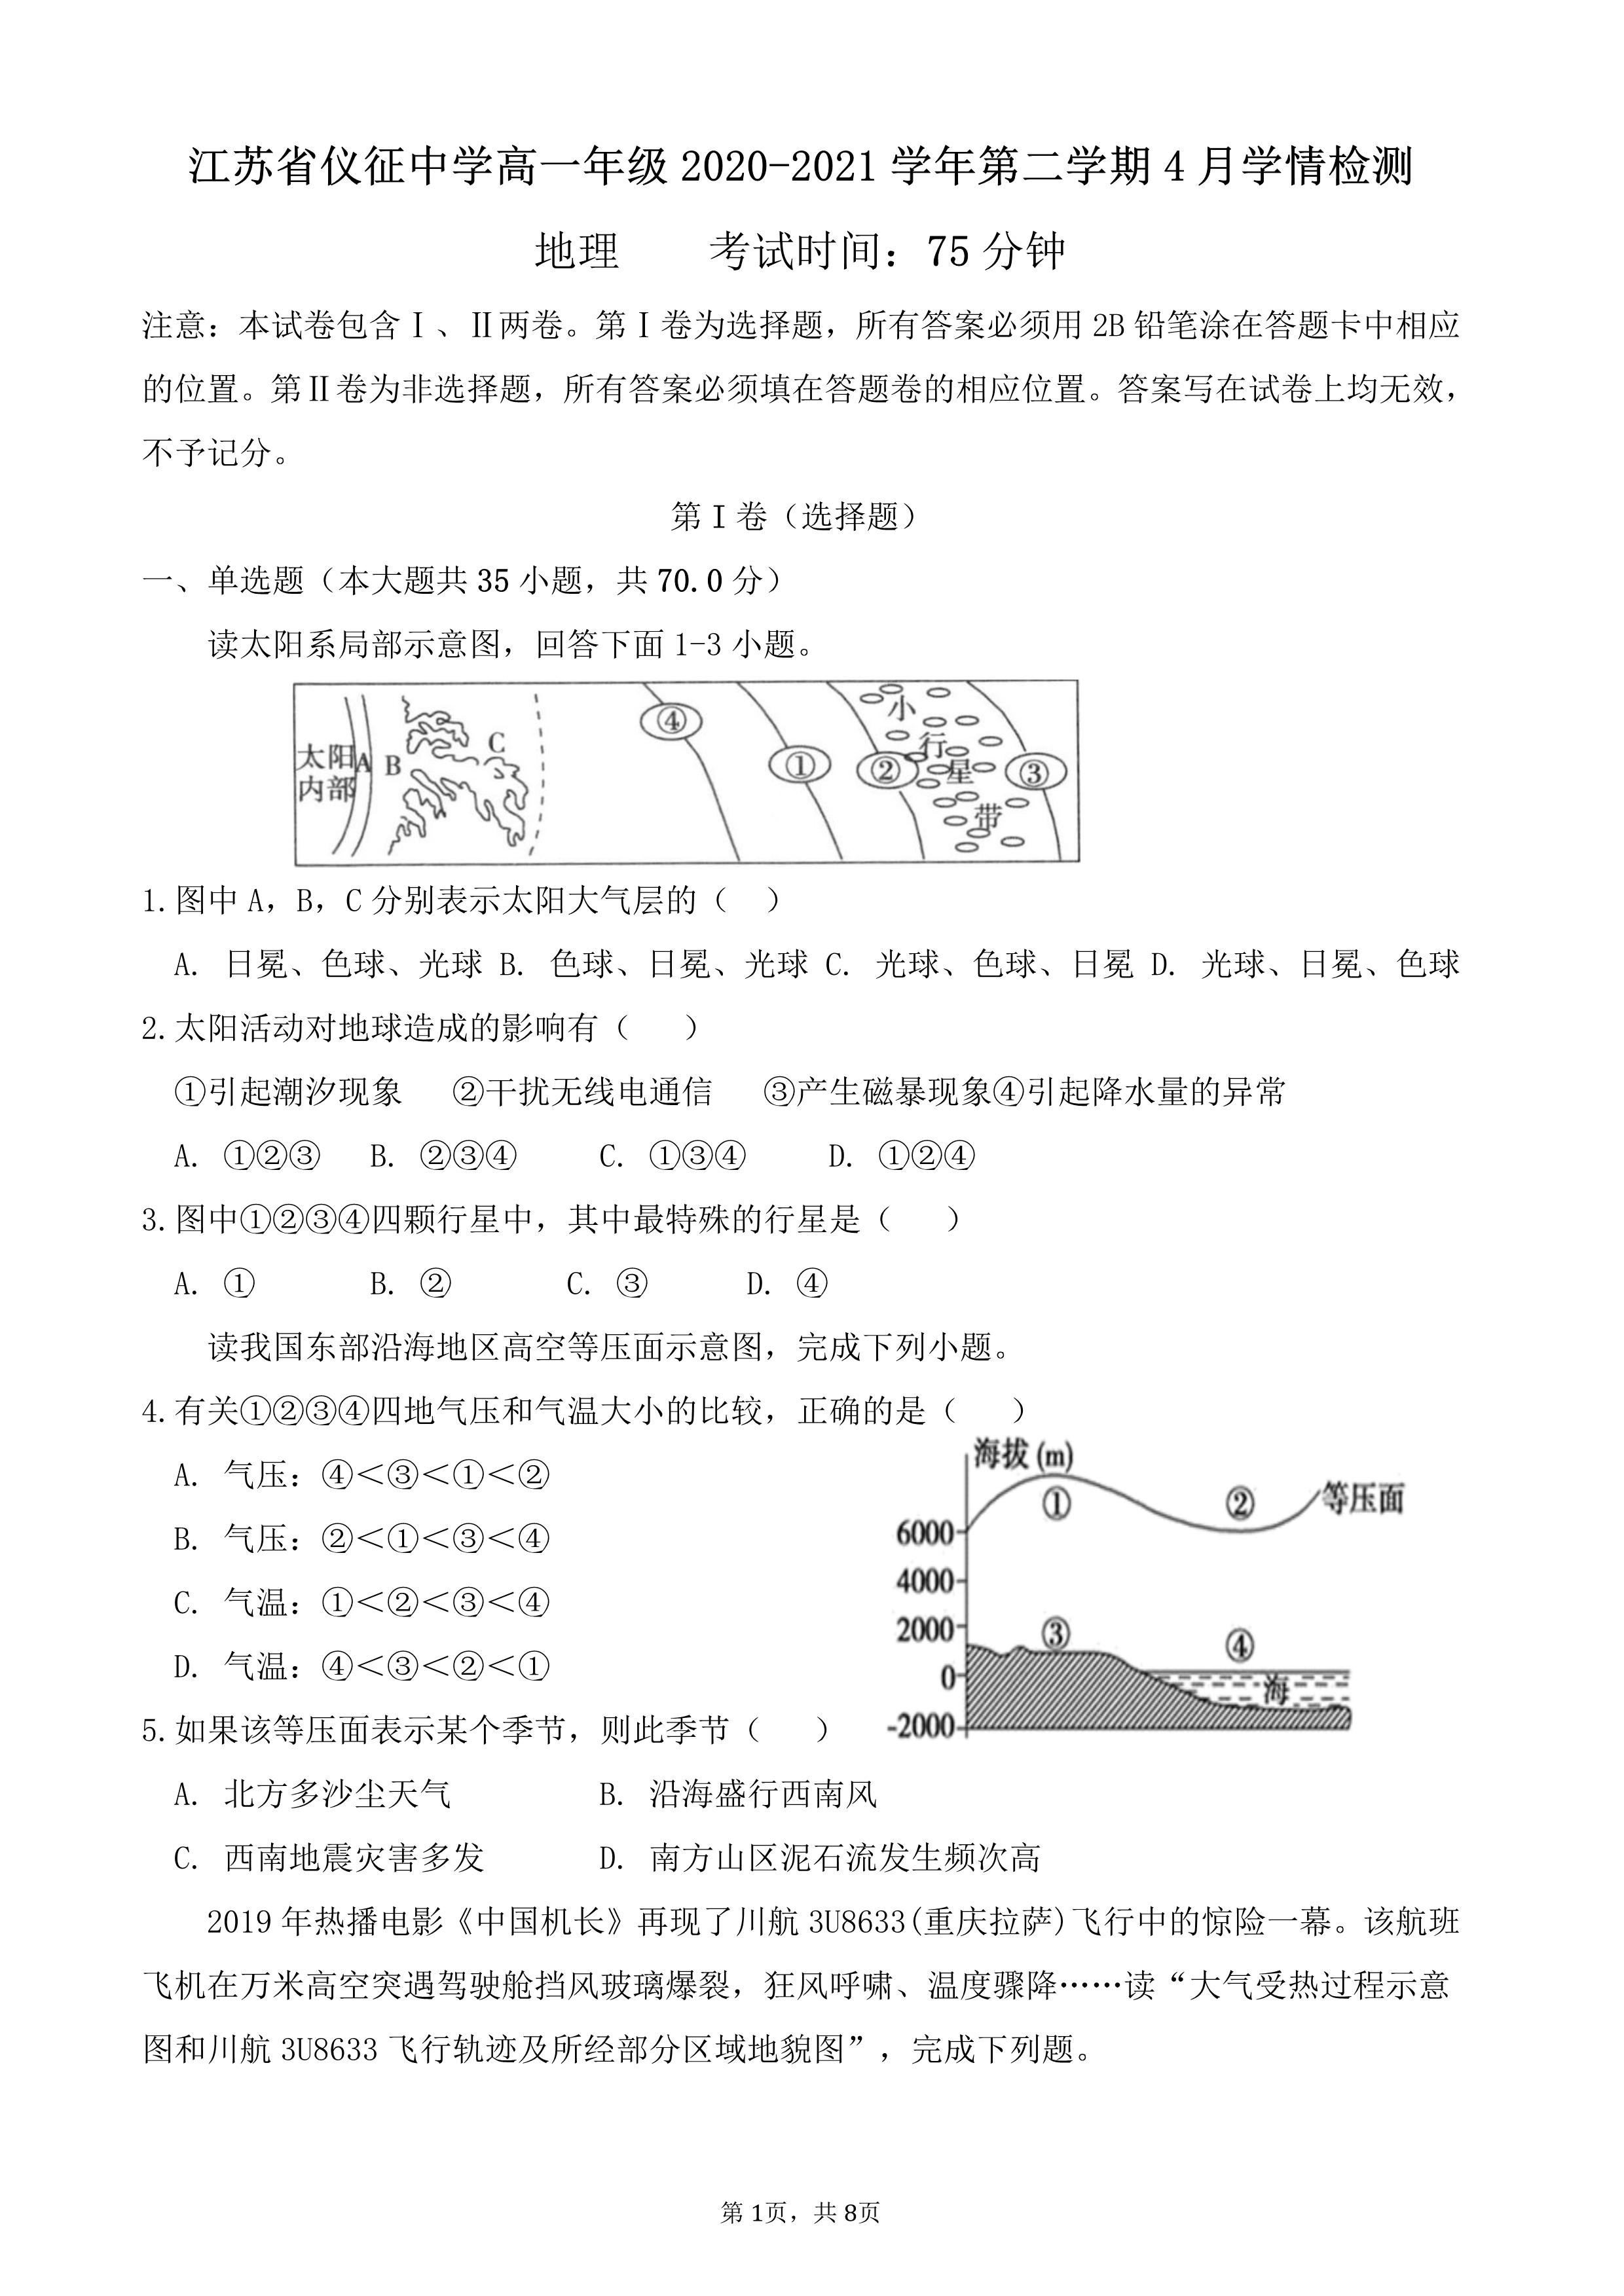 《KS5U发布》江苏省扬州中学20210-2021学年高一下学期5月月考试题 地理 Word版含答案